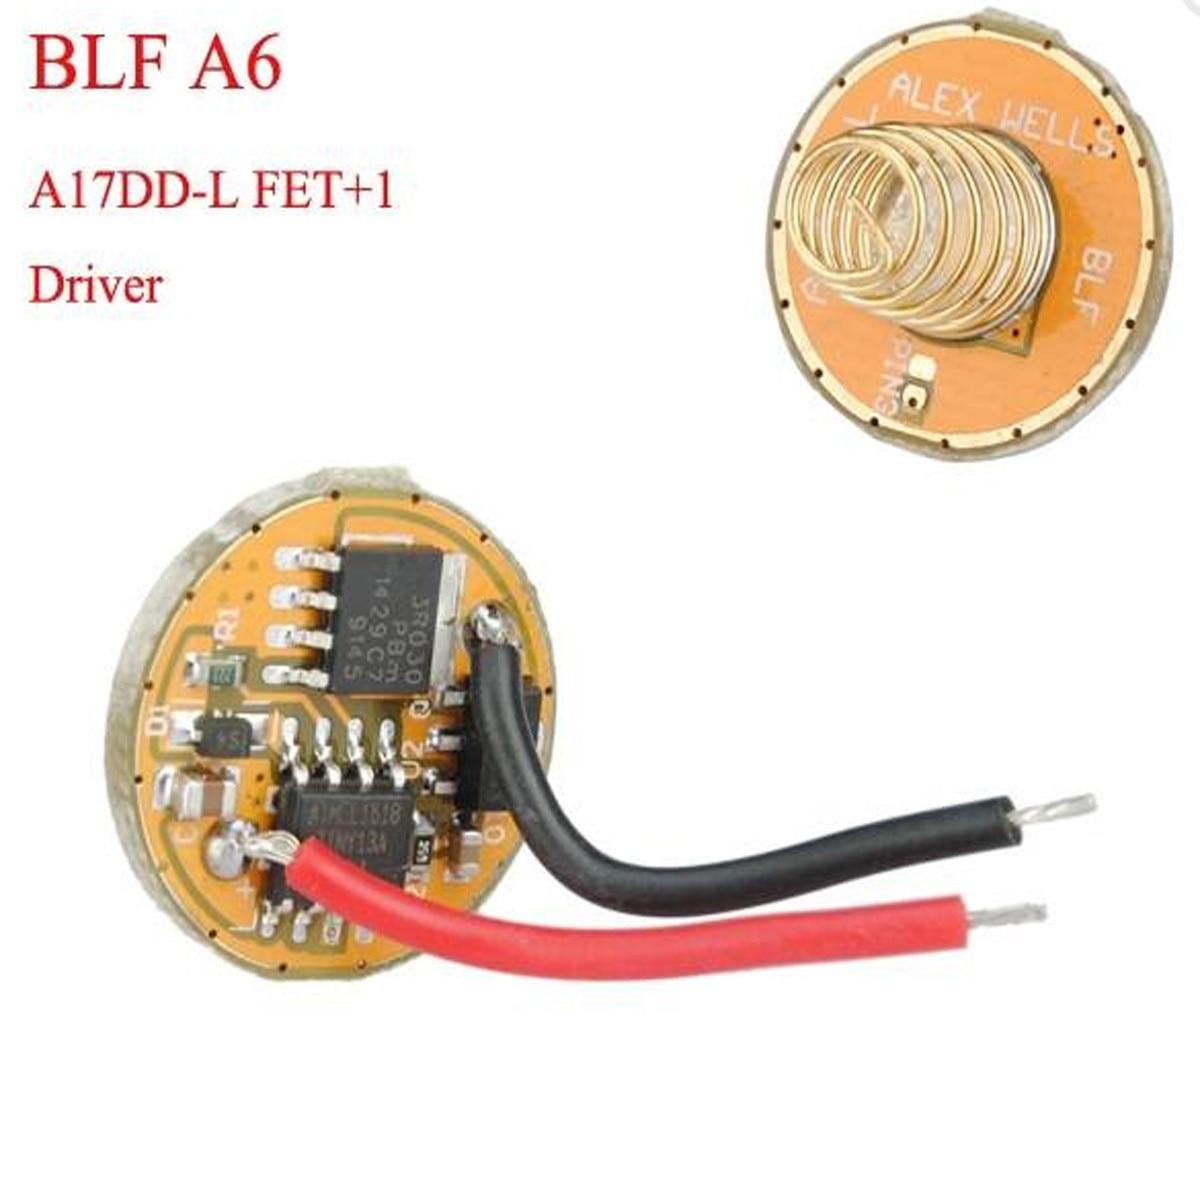 CLAITE S1/BLF A6 A17DD-L FET+1 2.8-4.35v 7/4 Modes Flashlight Driver Flashlight Accessories